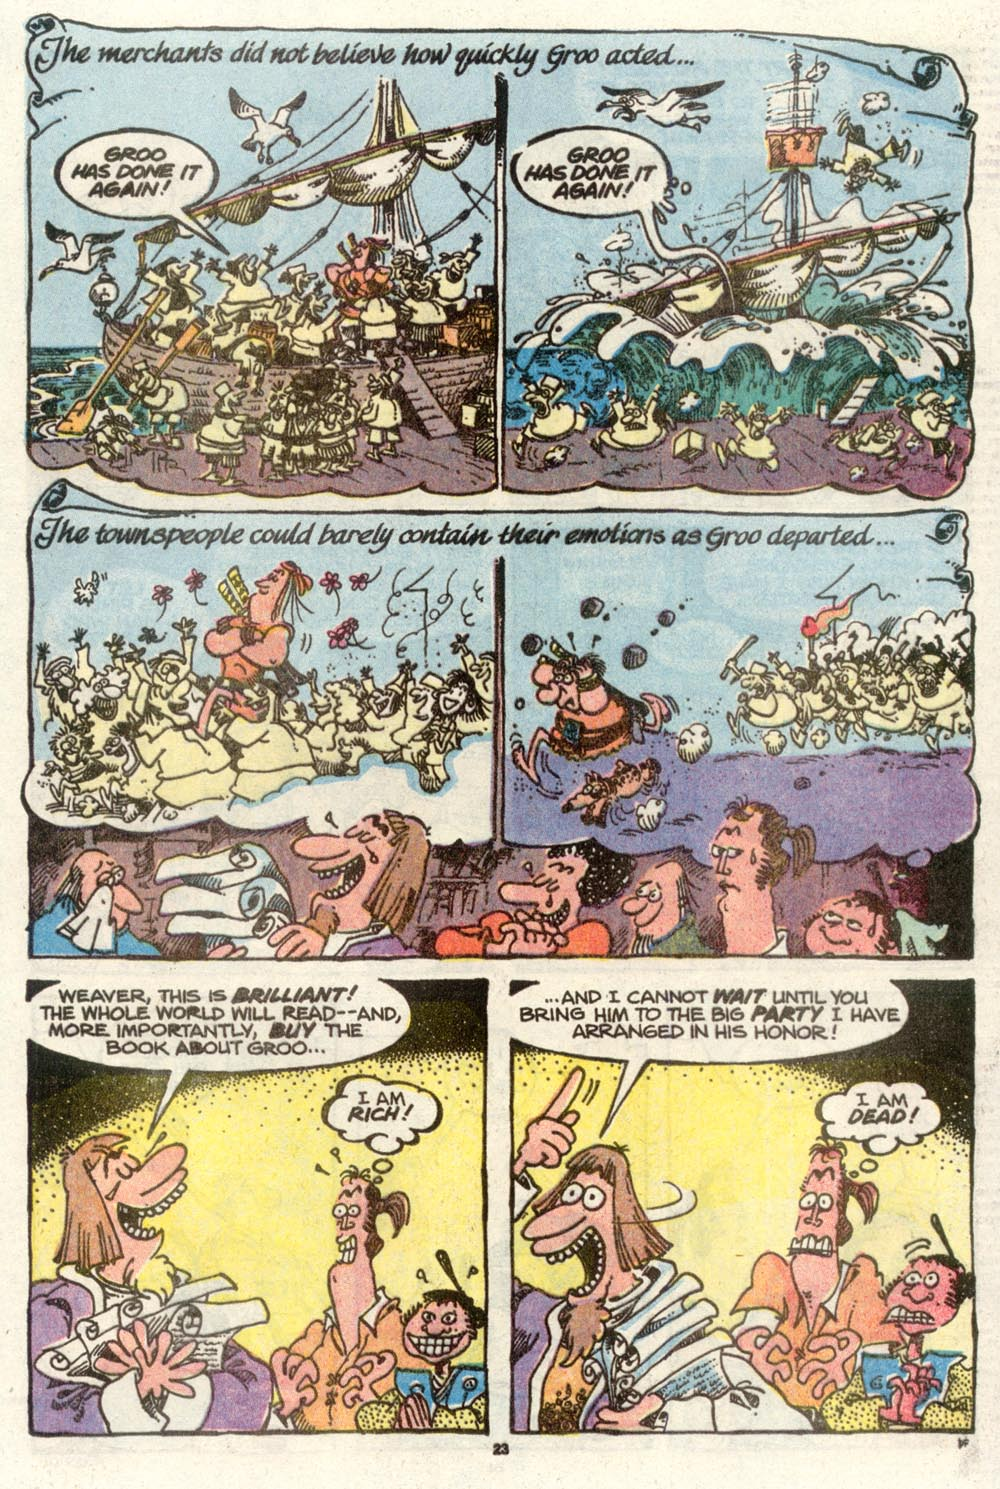 Read online Sergio Aragonés Groo the Wanderer comic -  Issue #70 - 17